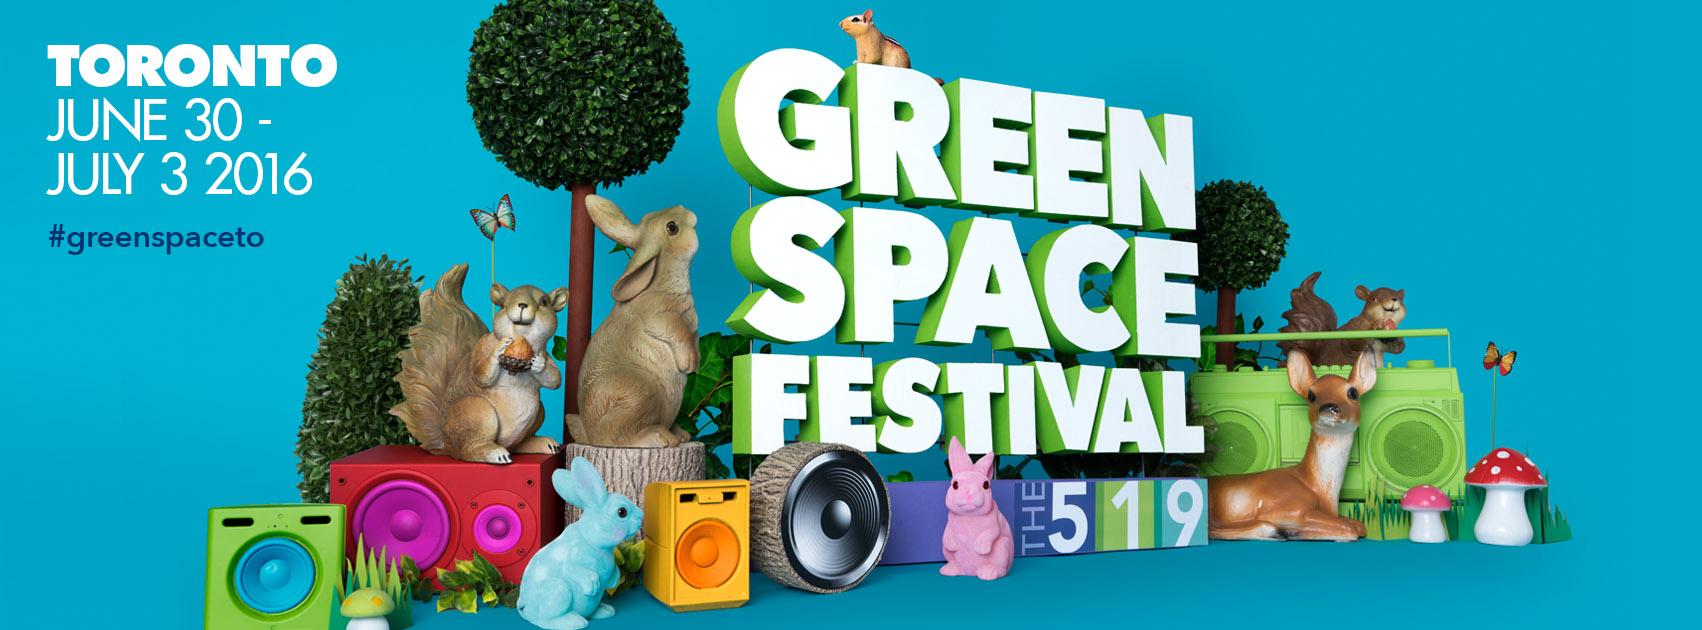 greenspace2016-01